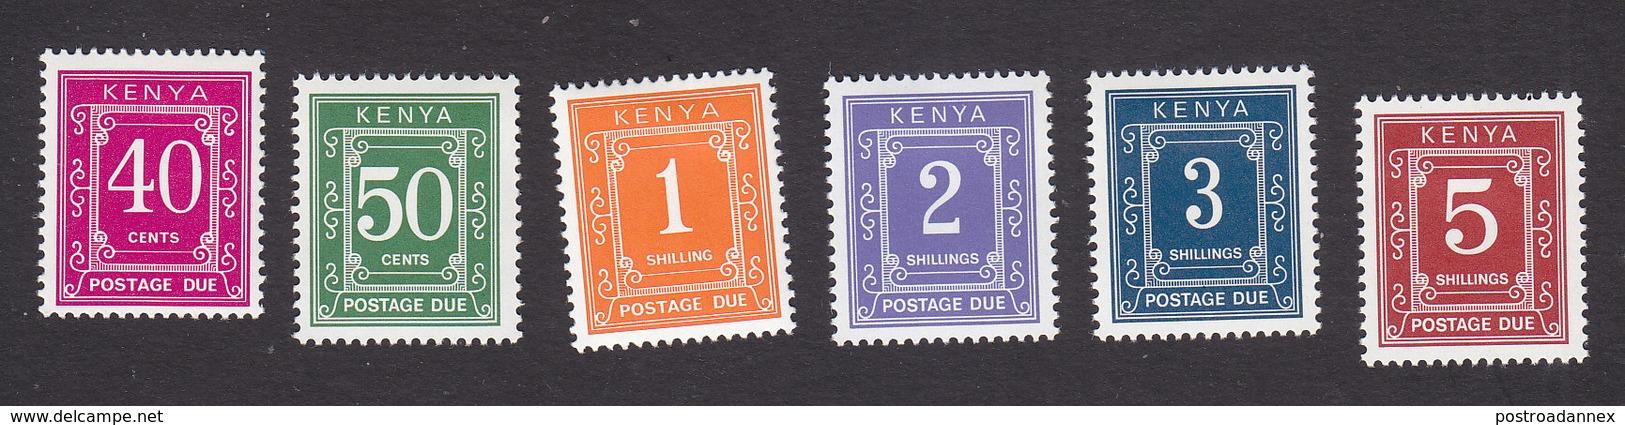 Kenya, Scott #J9-J10, J11-J14, Mint Hinged, Postage Due, Issued 1987-98 - Kenya (1963-...)